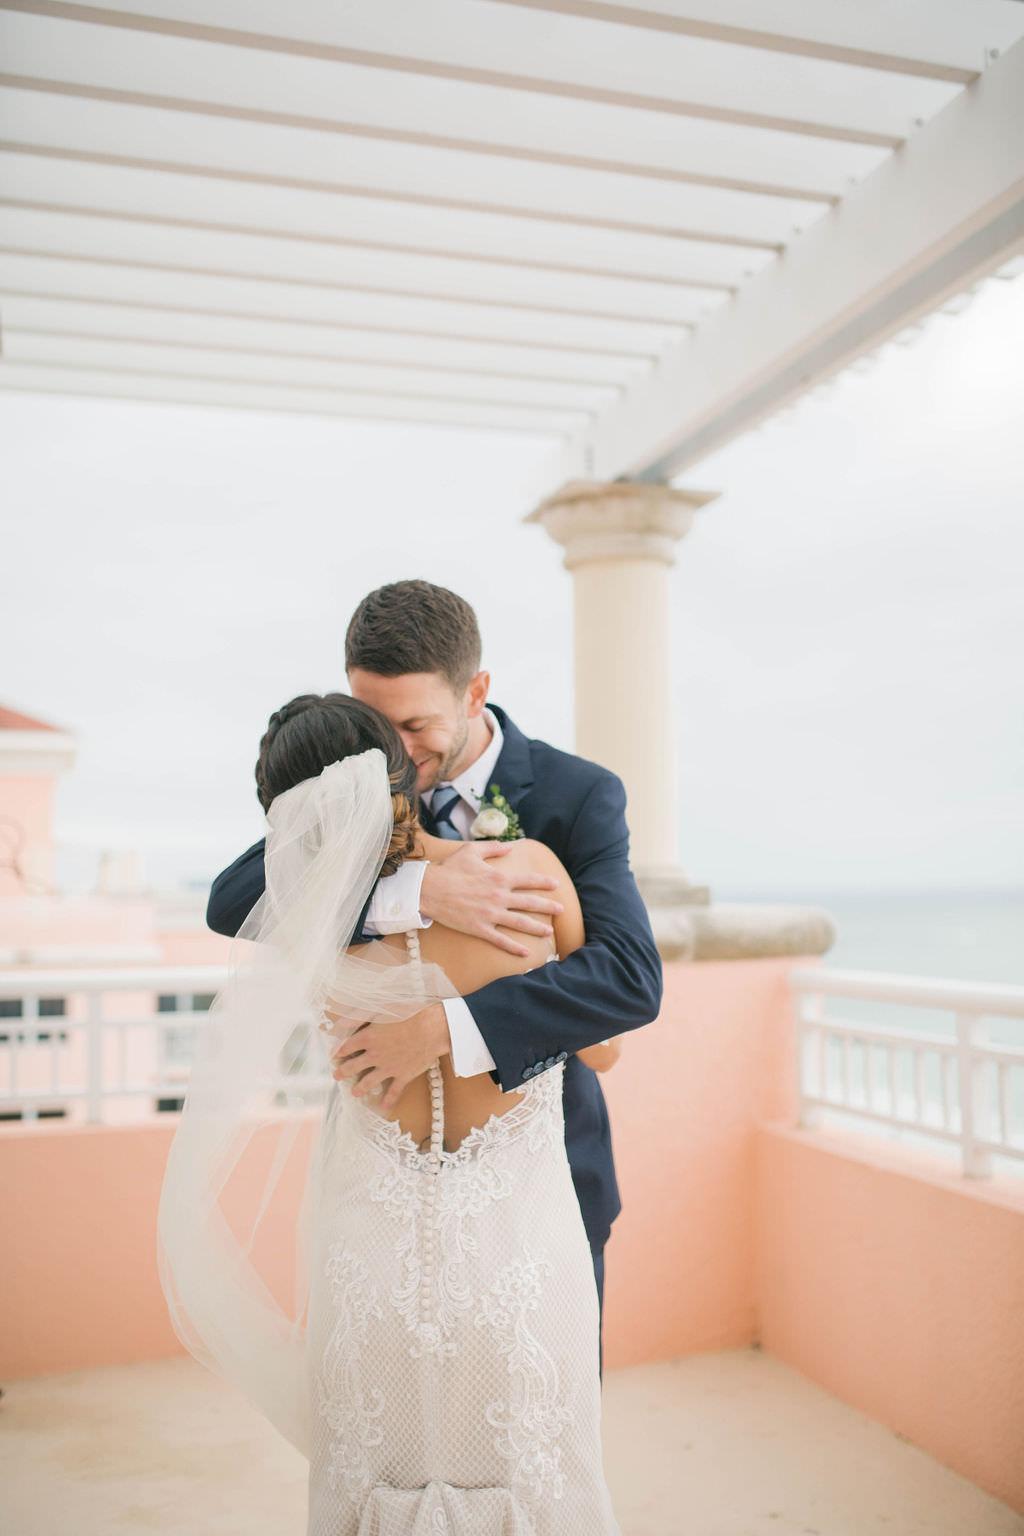 Tampa Bay Bride and Groom First Look Wedding Portrait on Rooftop Terrace at Waterfront Clearwater Beach Hotel Wedding Venue Hyatt Regency Clearwater Beach